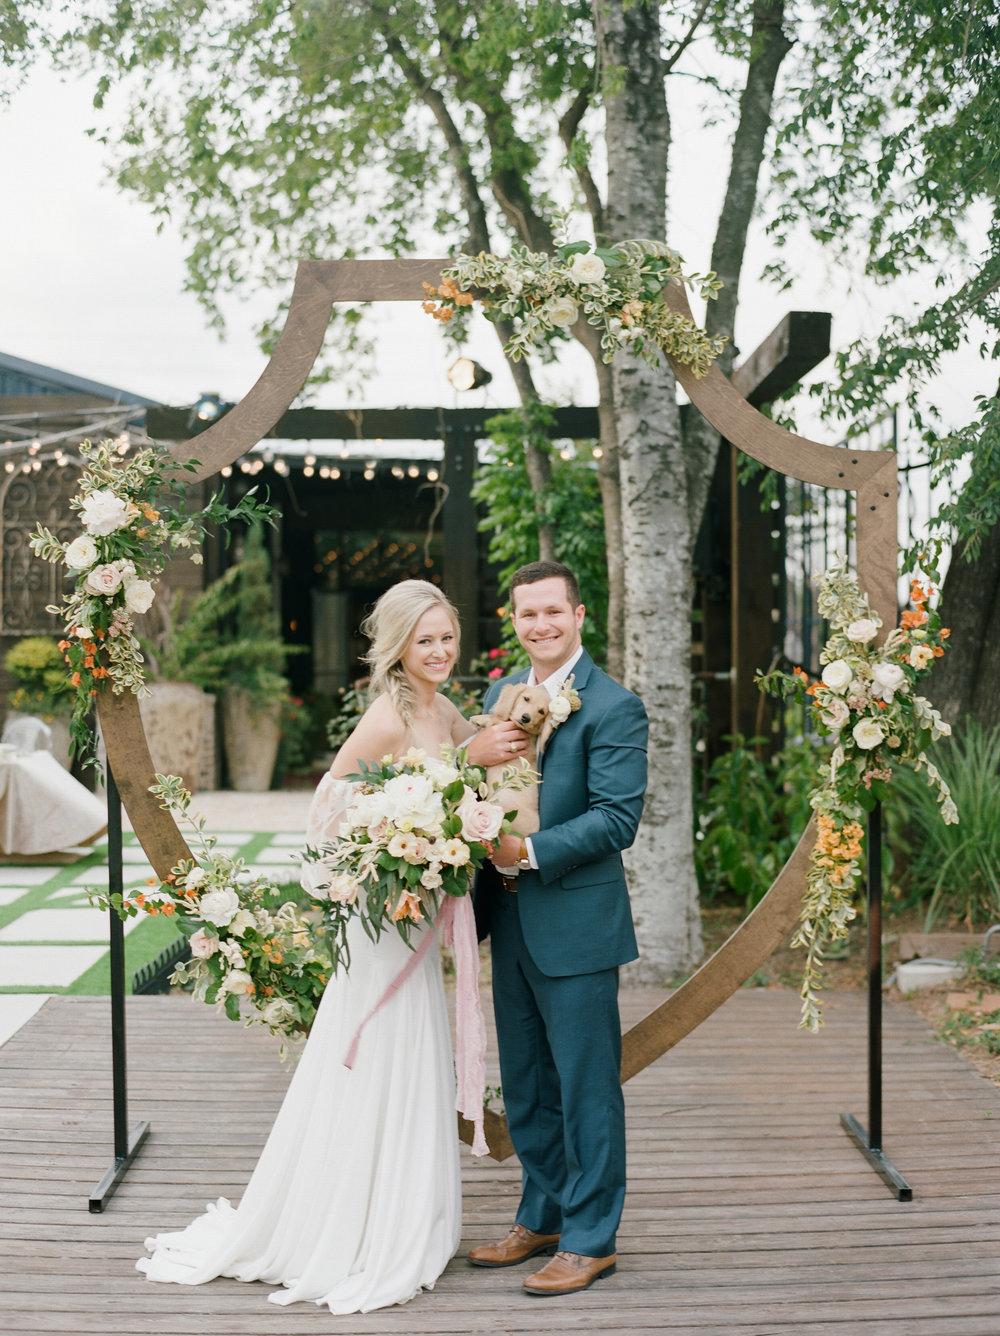 Houston-Wedding-Photographer-Fine-Art-Film-Destination-Style-Me-Pretty-Austin-Dallas-New-Orleans-Dana-Fernandez-Photography-1.jpg